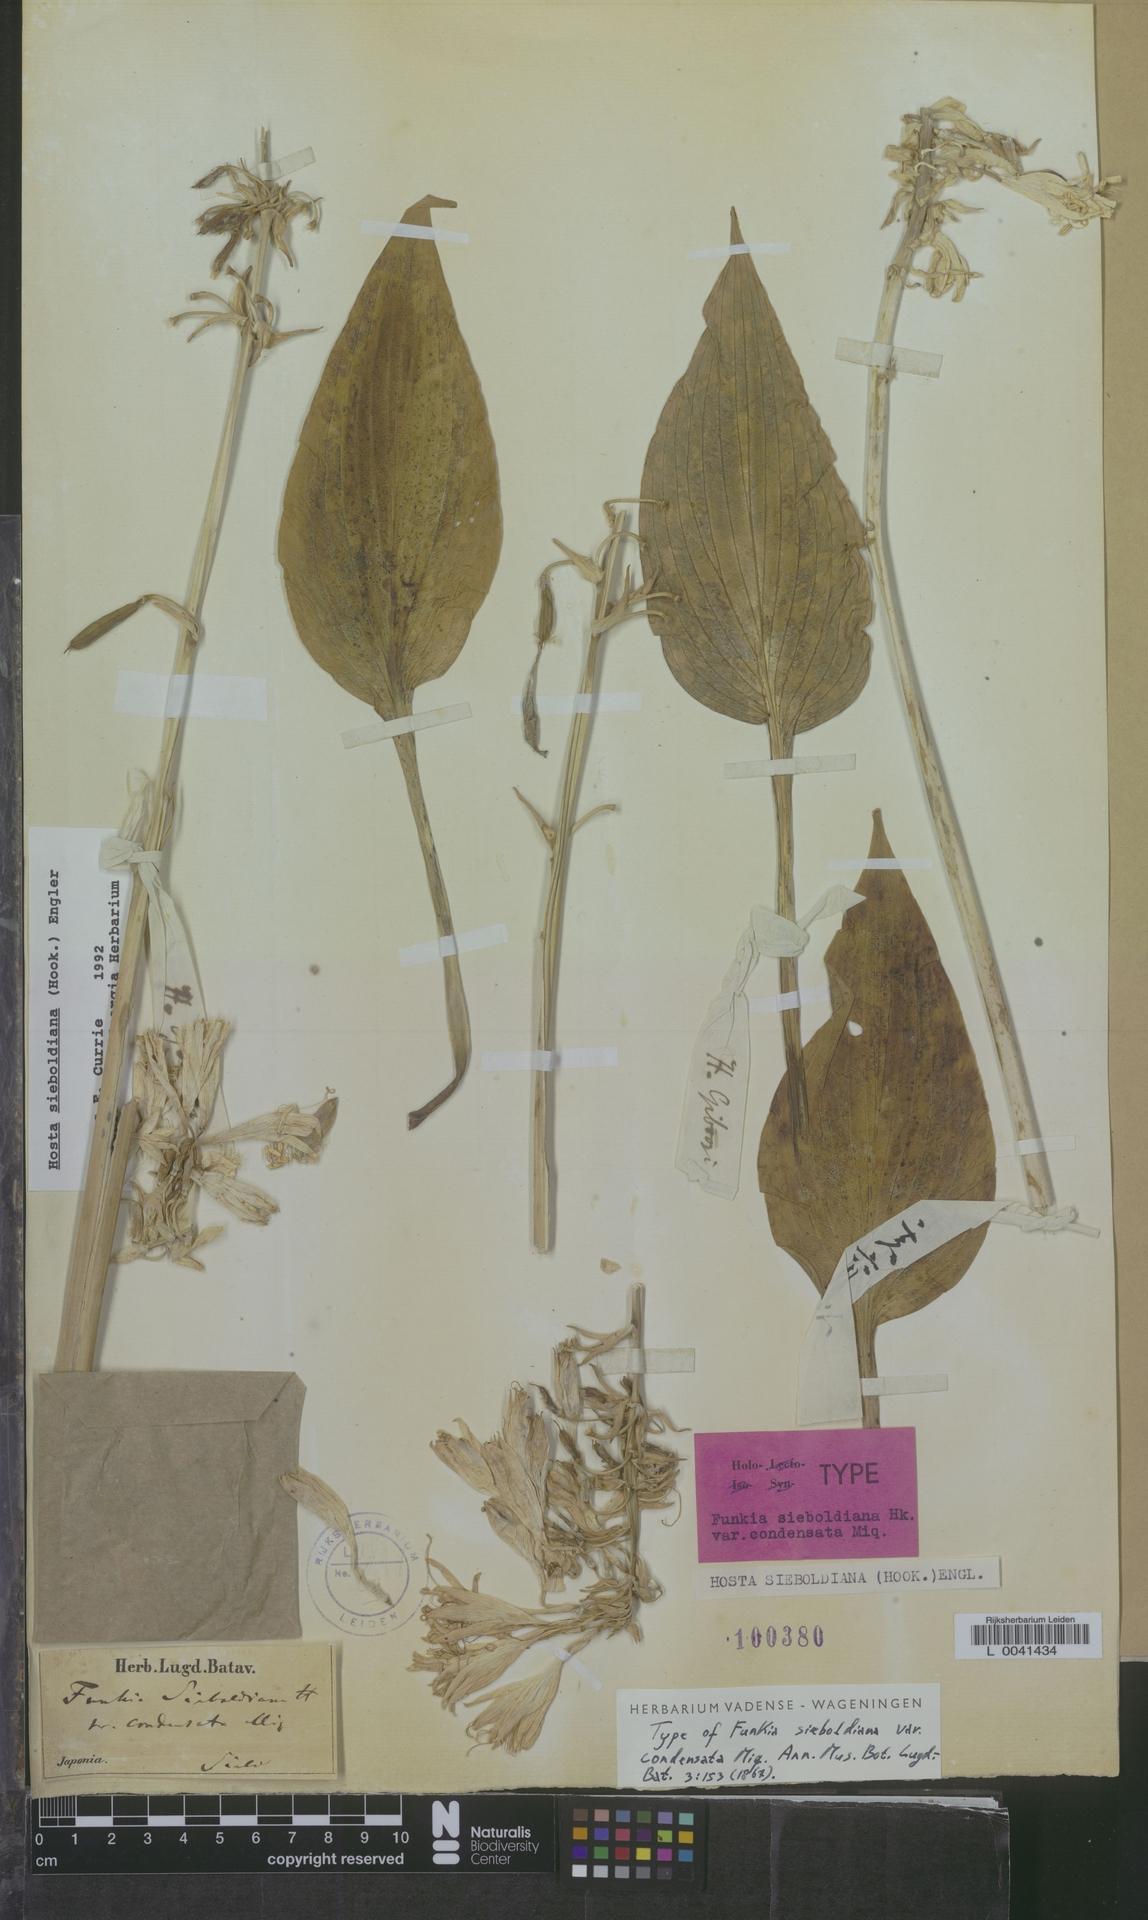 L  0041434 | Hosta sieboldiana (Hook.) Engl.